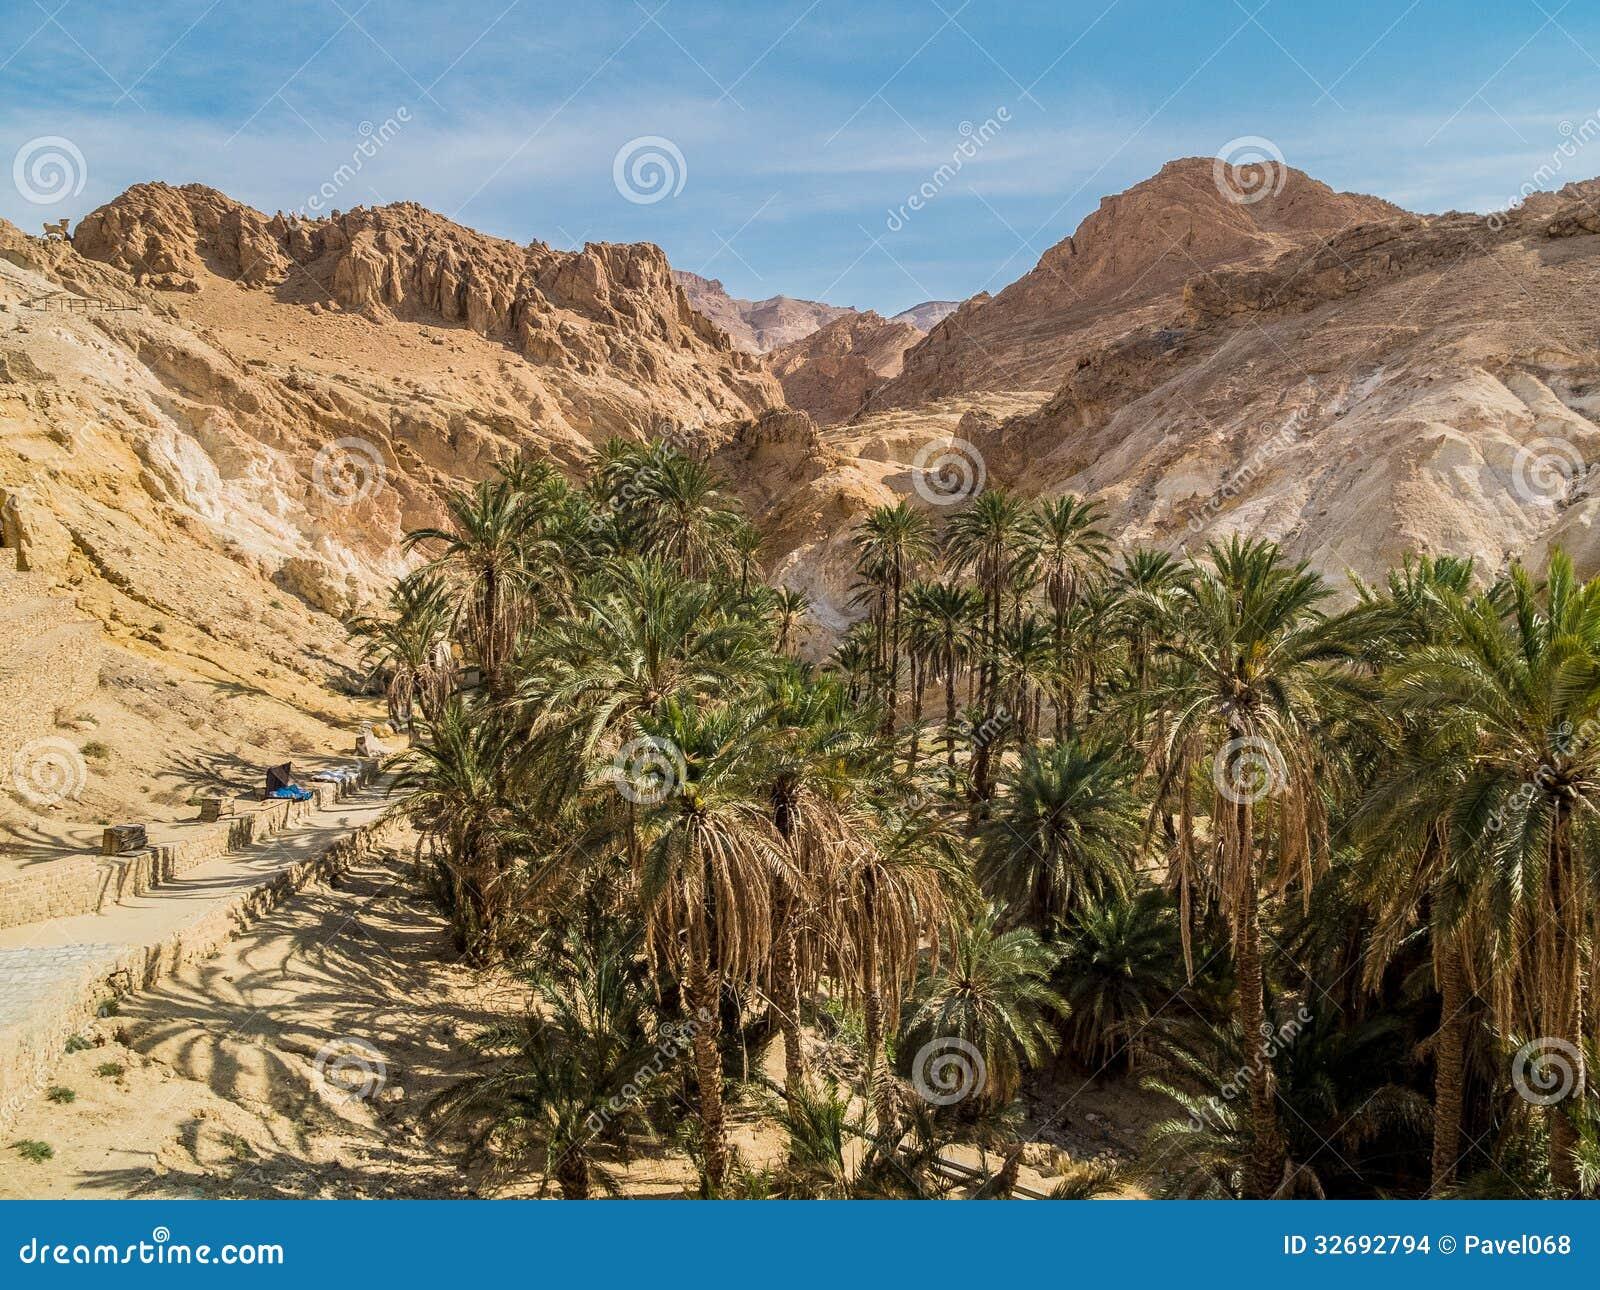 Mountain oasis chebika sahara desert tunisia view africa image32692794